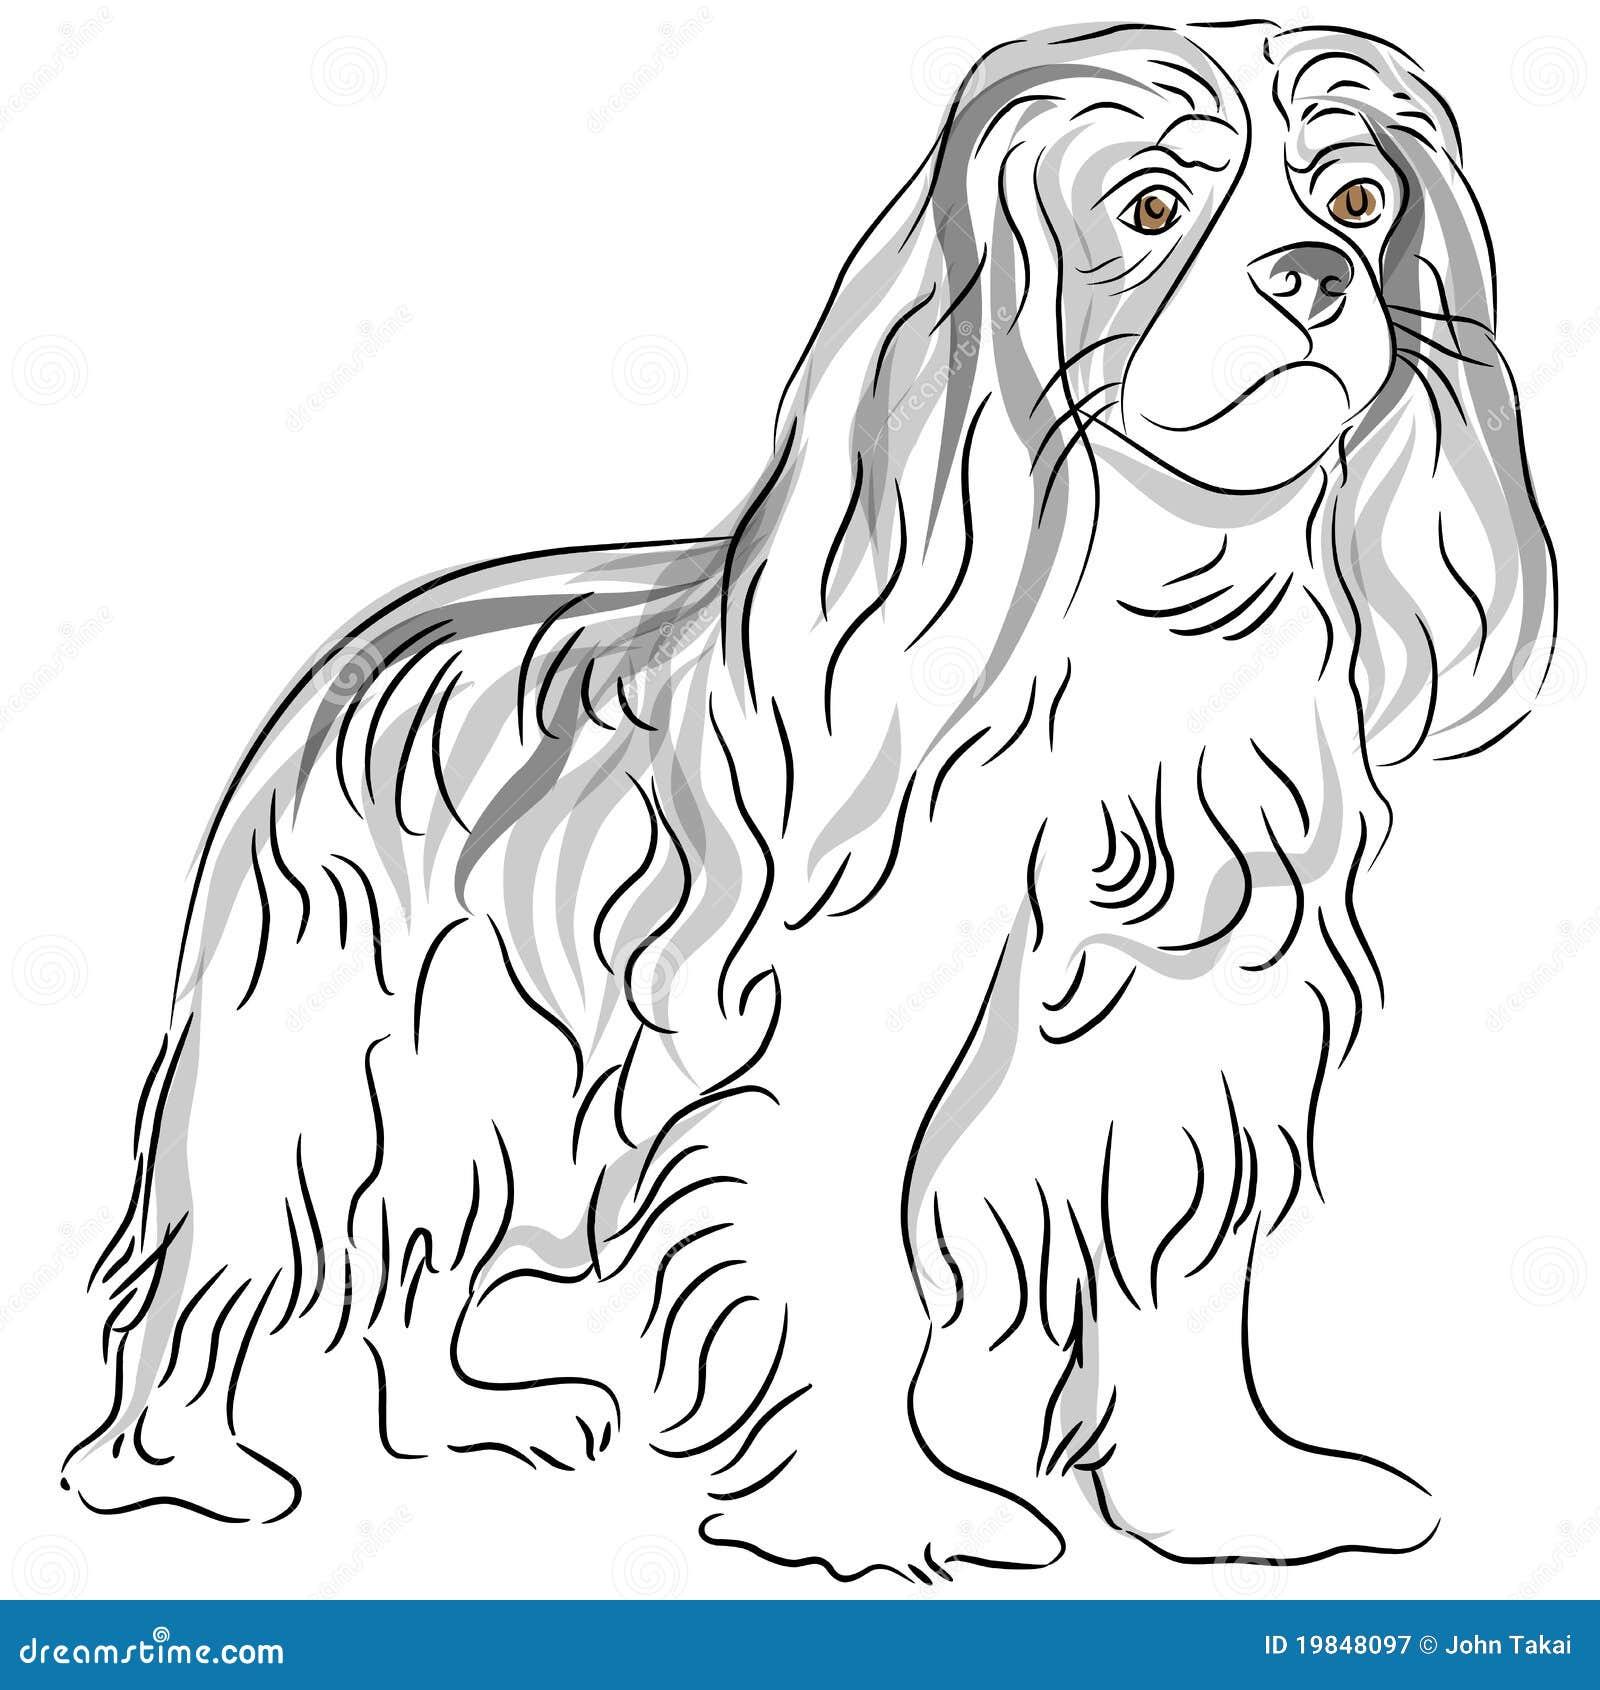 cavalier king charles spaniel drawing stock vector